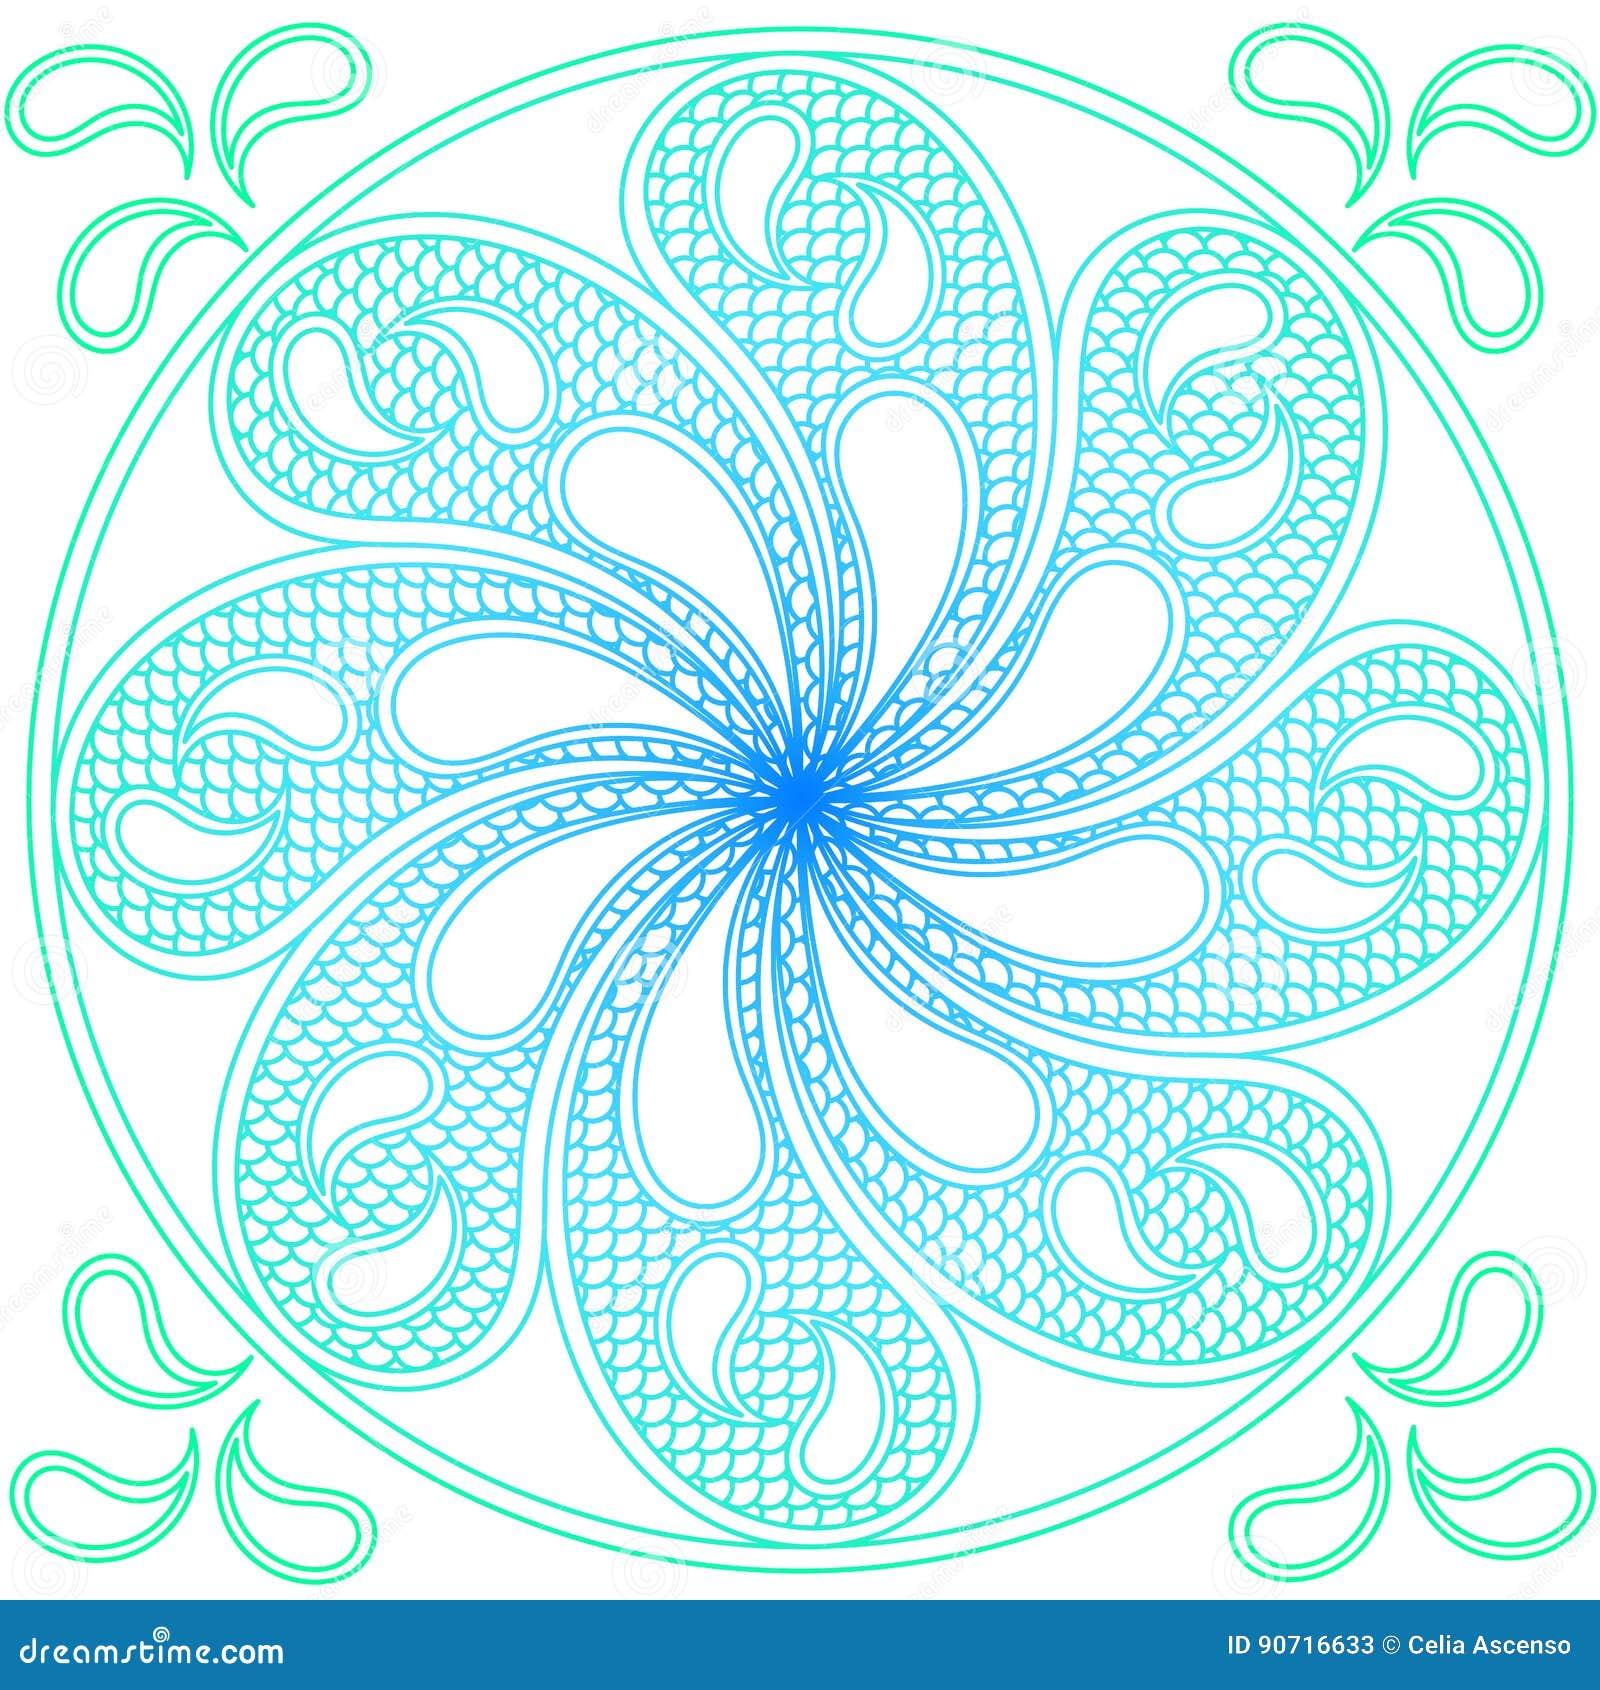 Water Mandala Ornament Stock Illustration